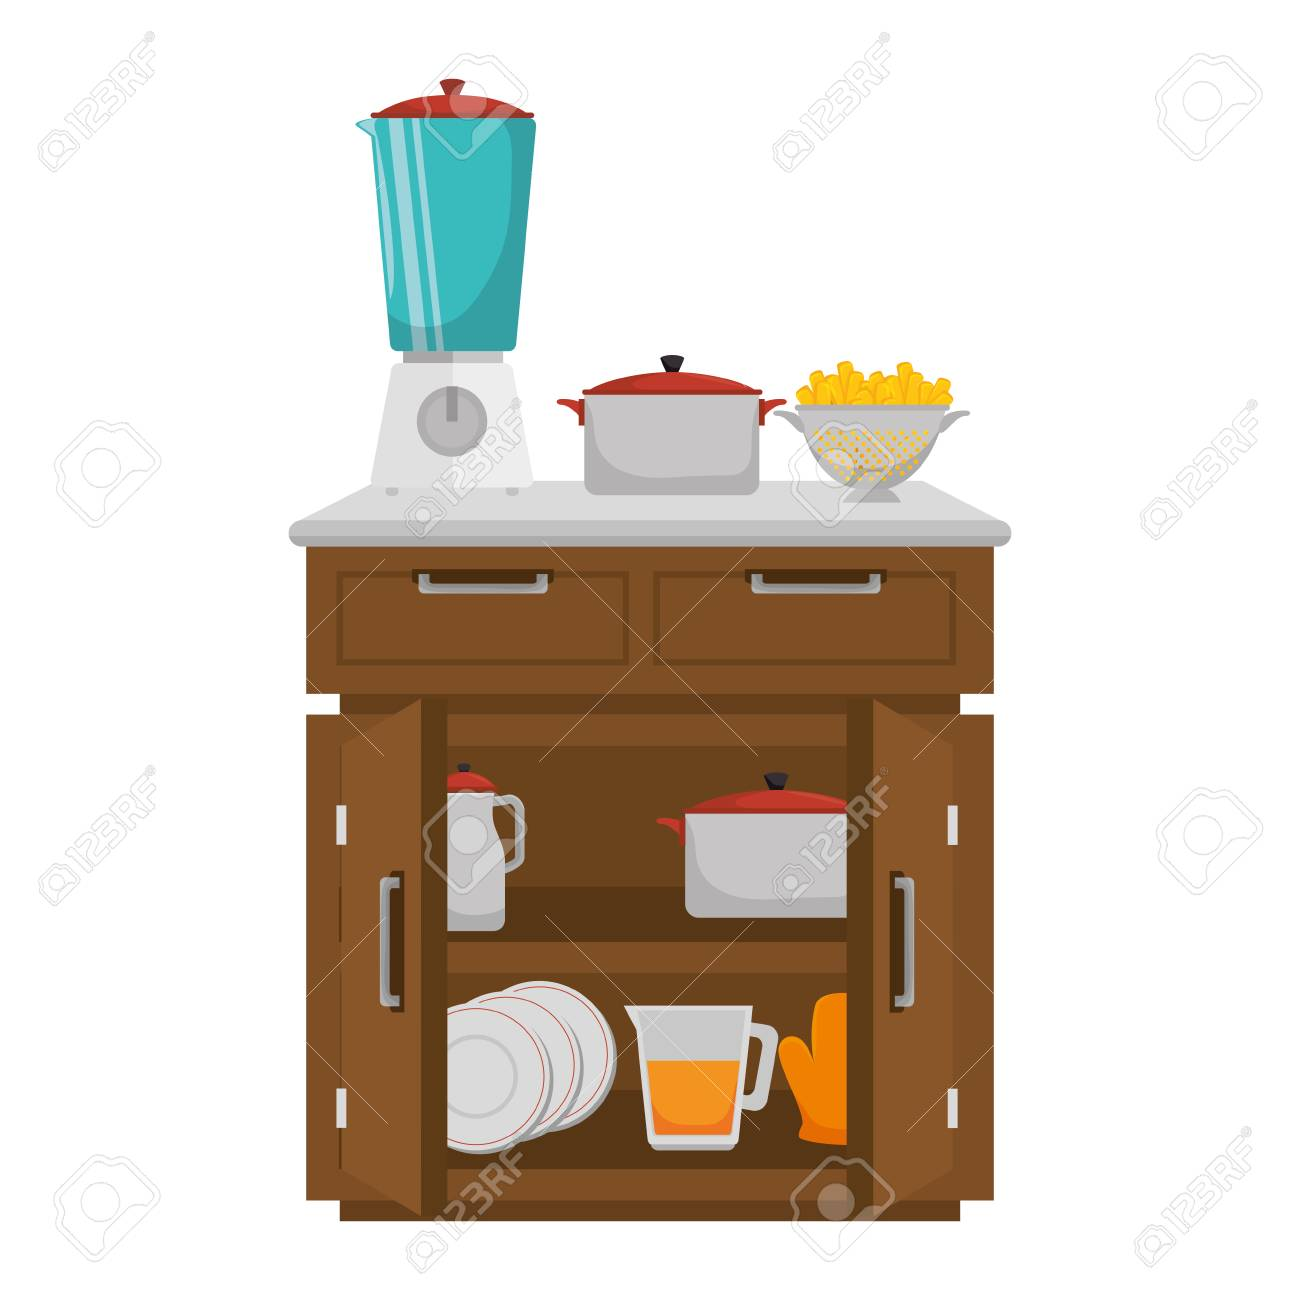 Küchenkommode Mit Gerätevektor Illustrationsdesign Lizenzfrei